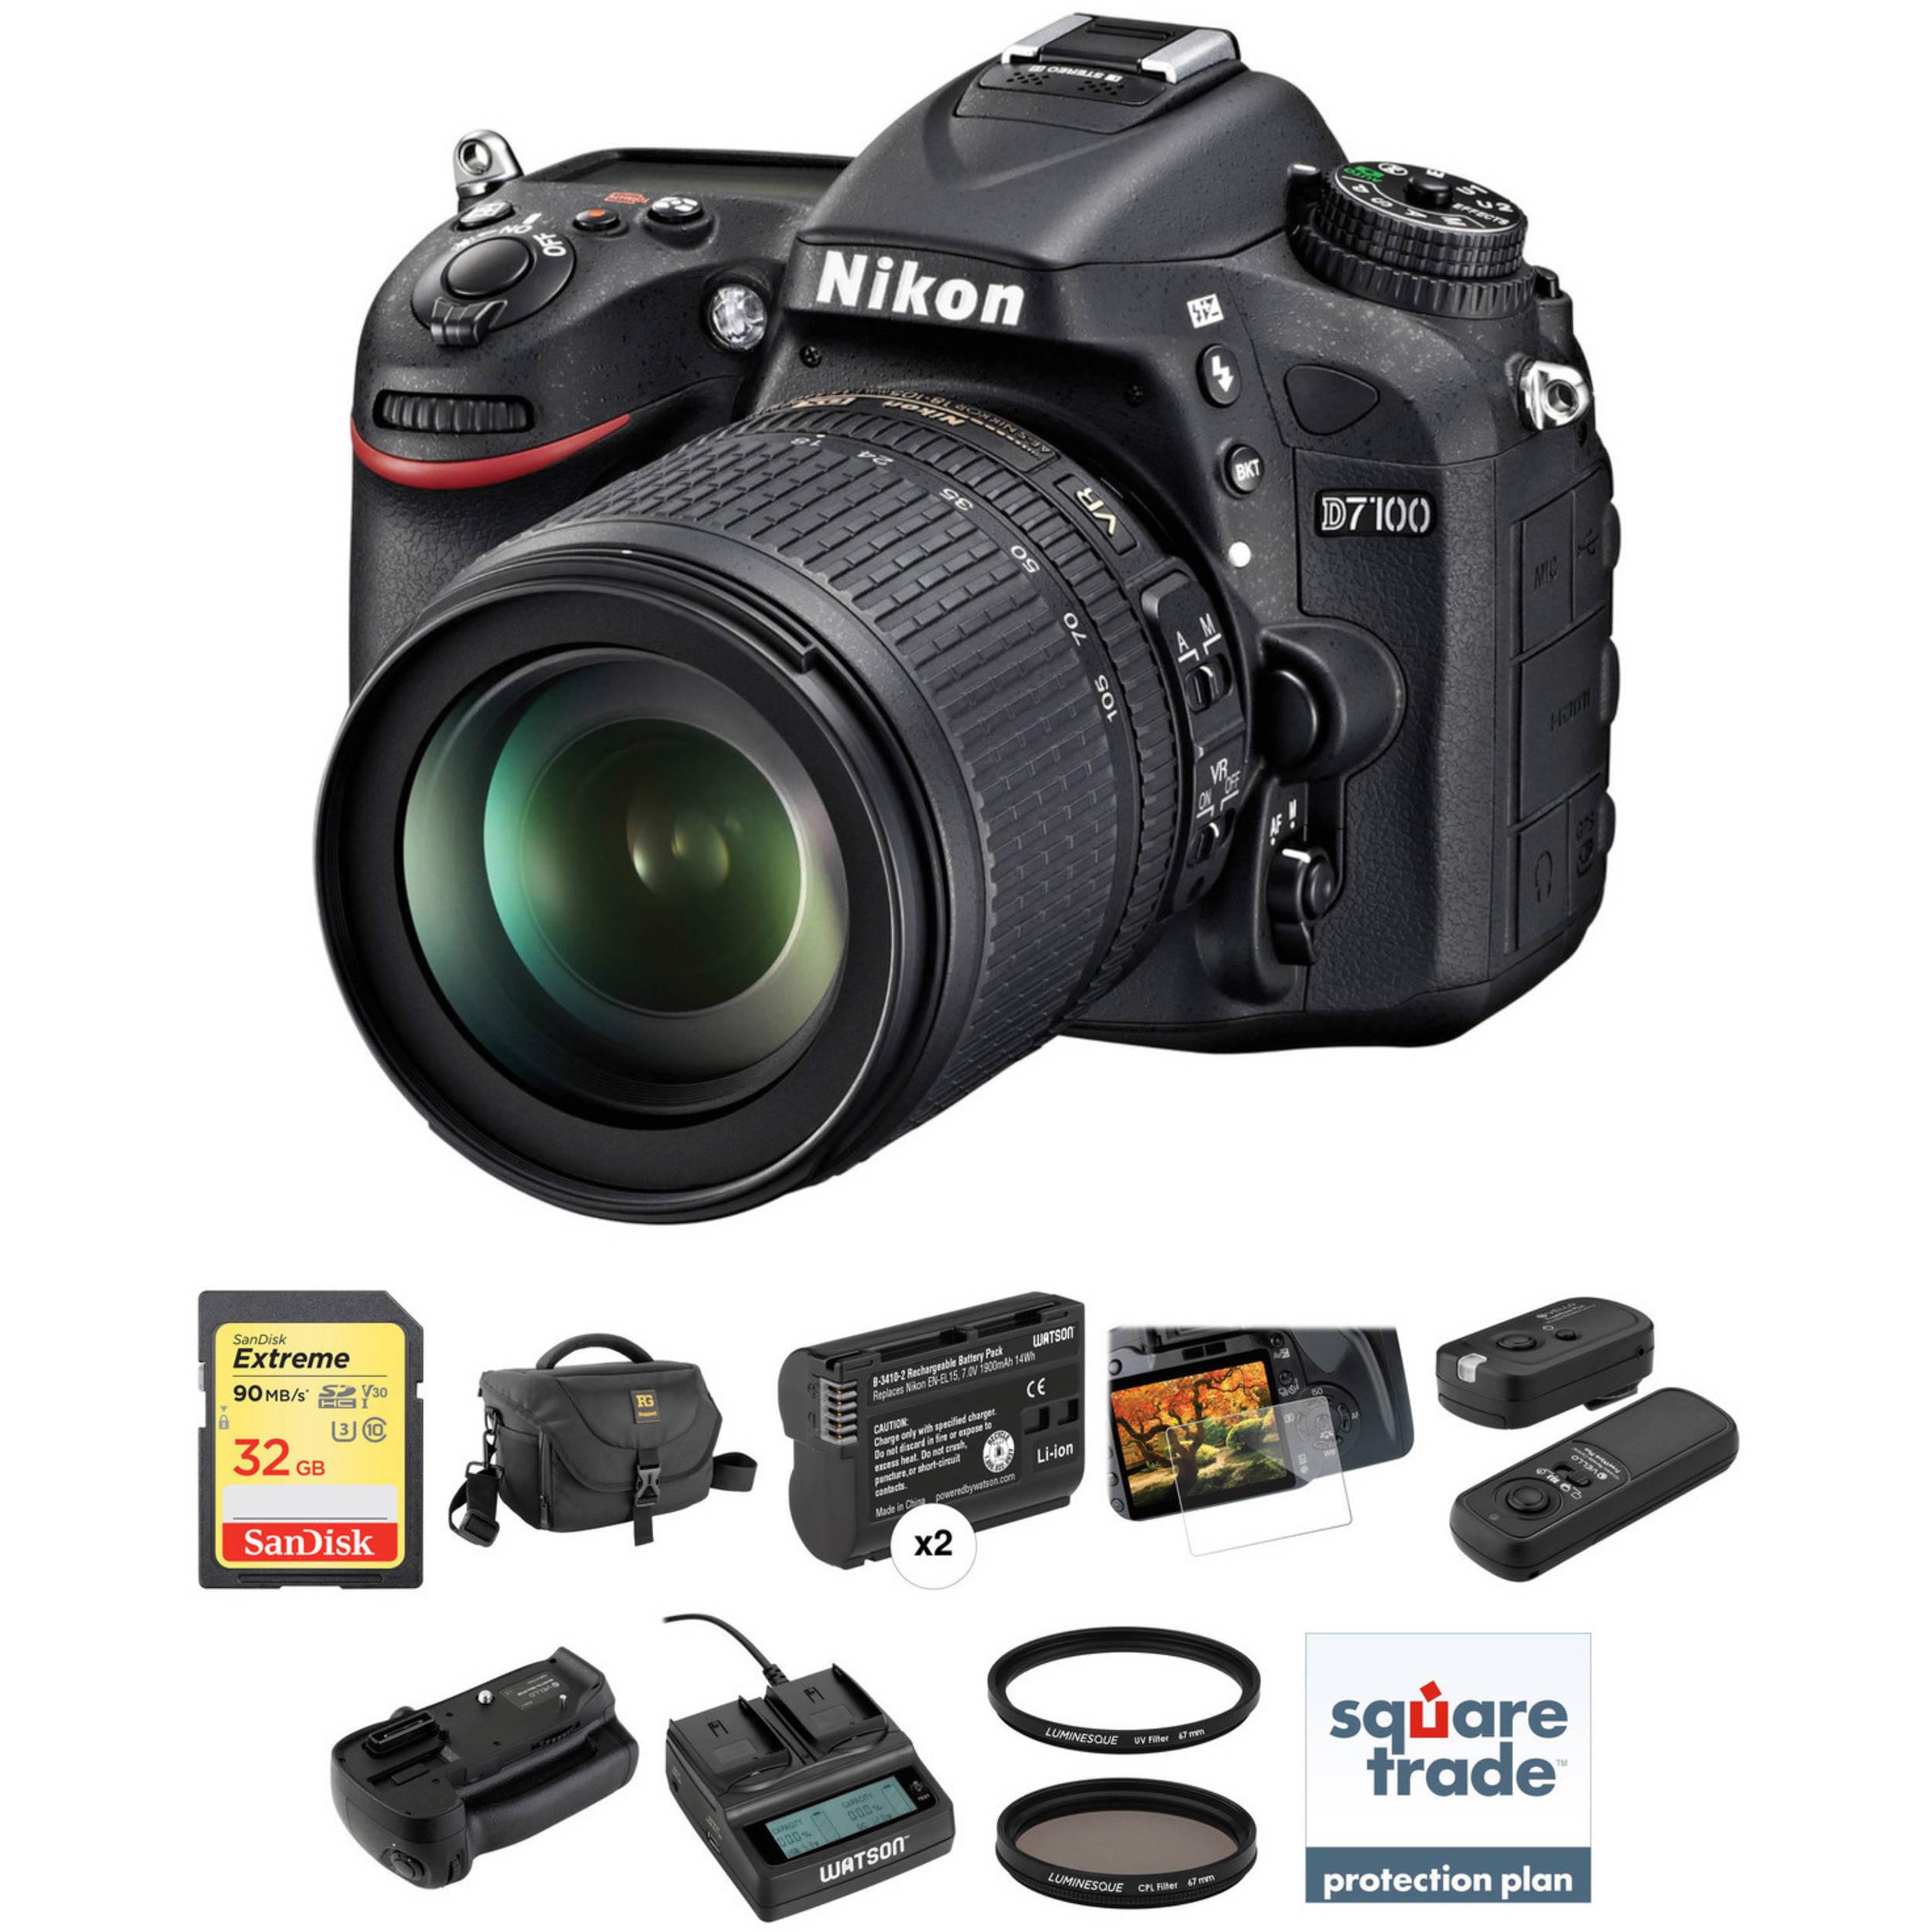 Nikon D7100 DSLR Camera with 18-105mm Lens Deluxe Kit B&H Photo